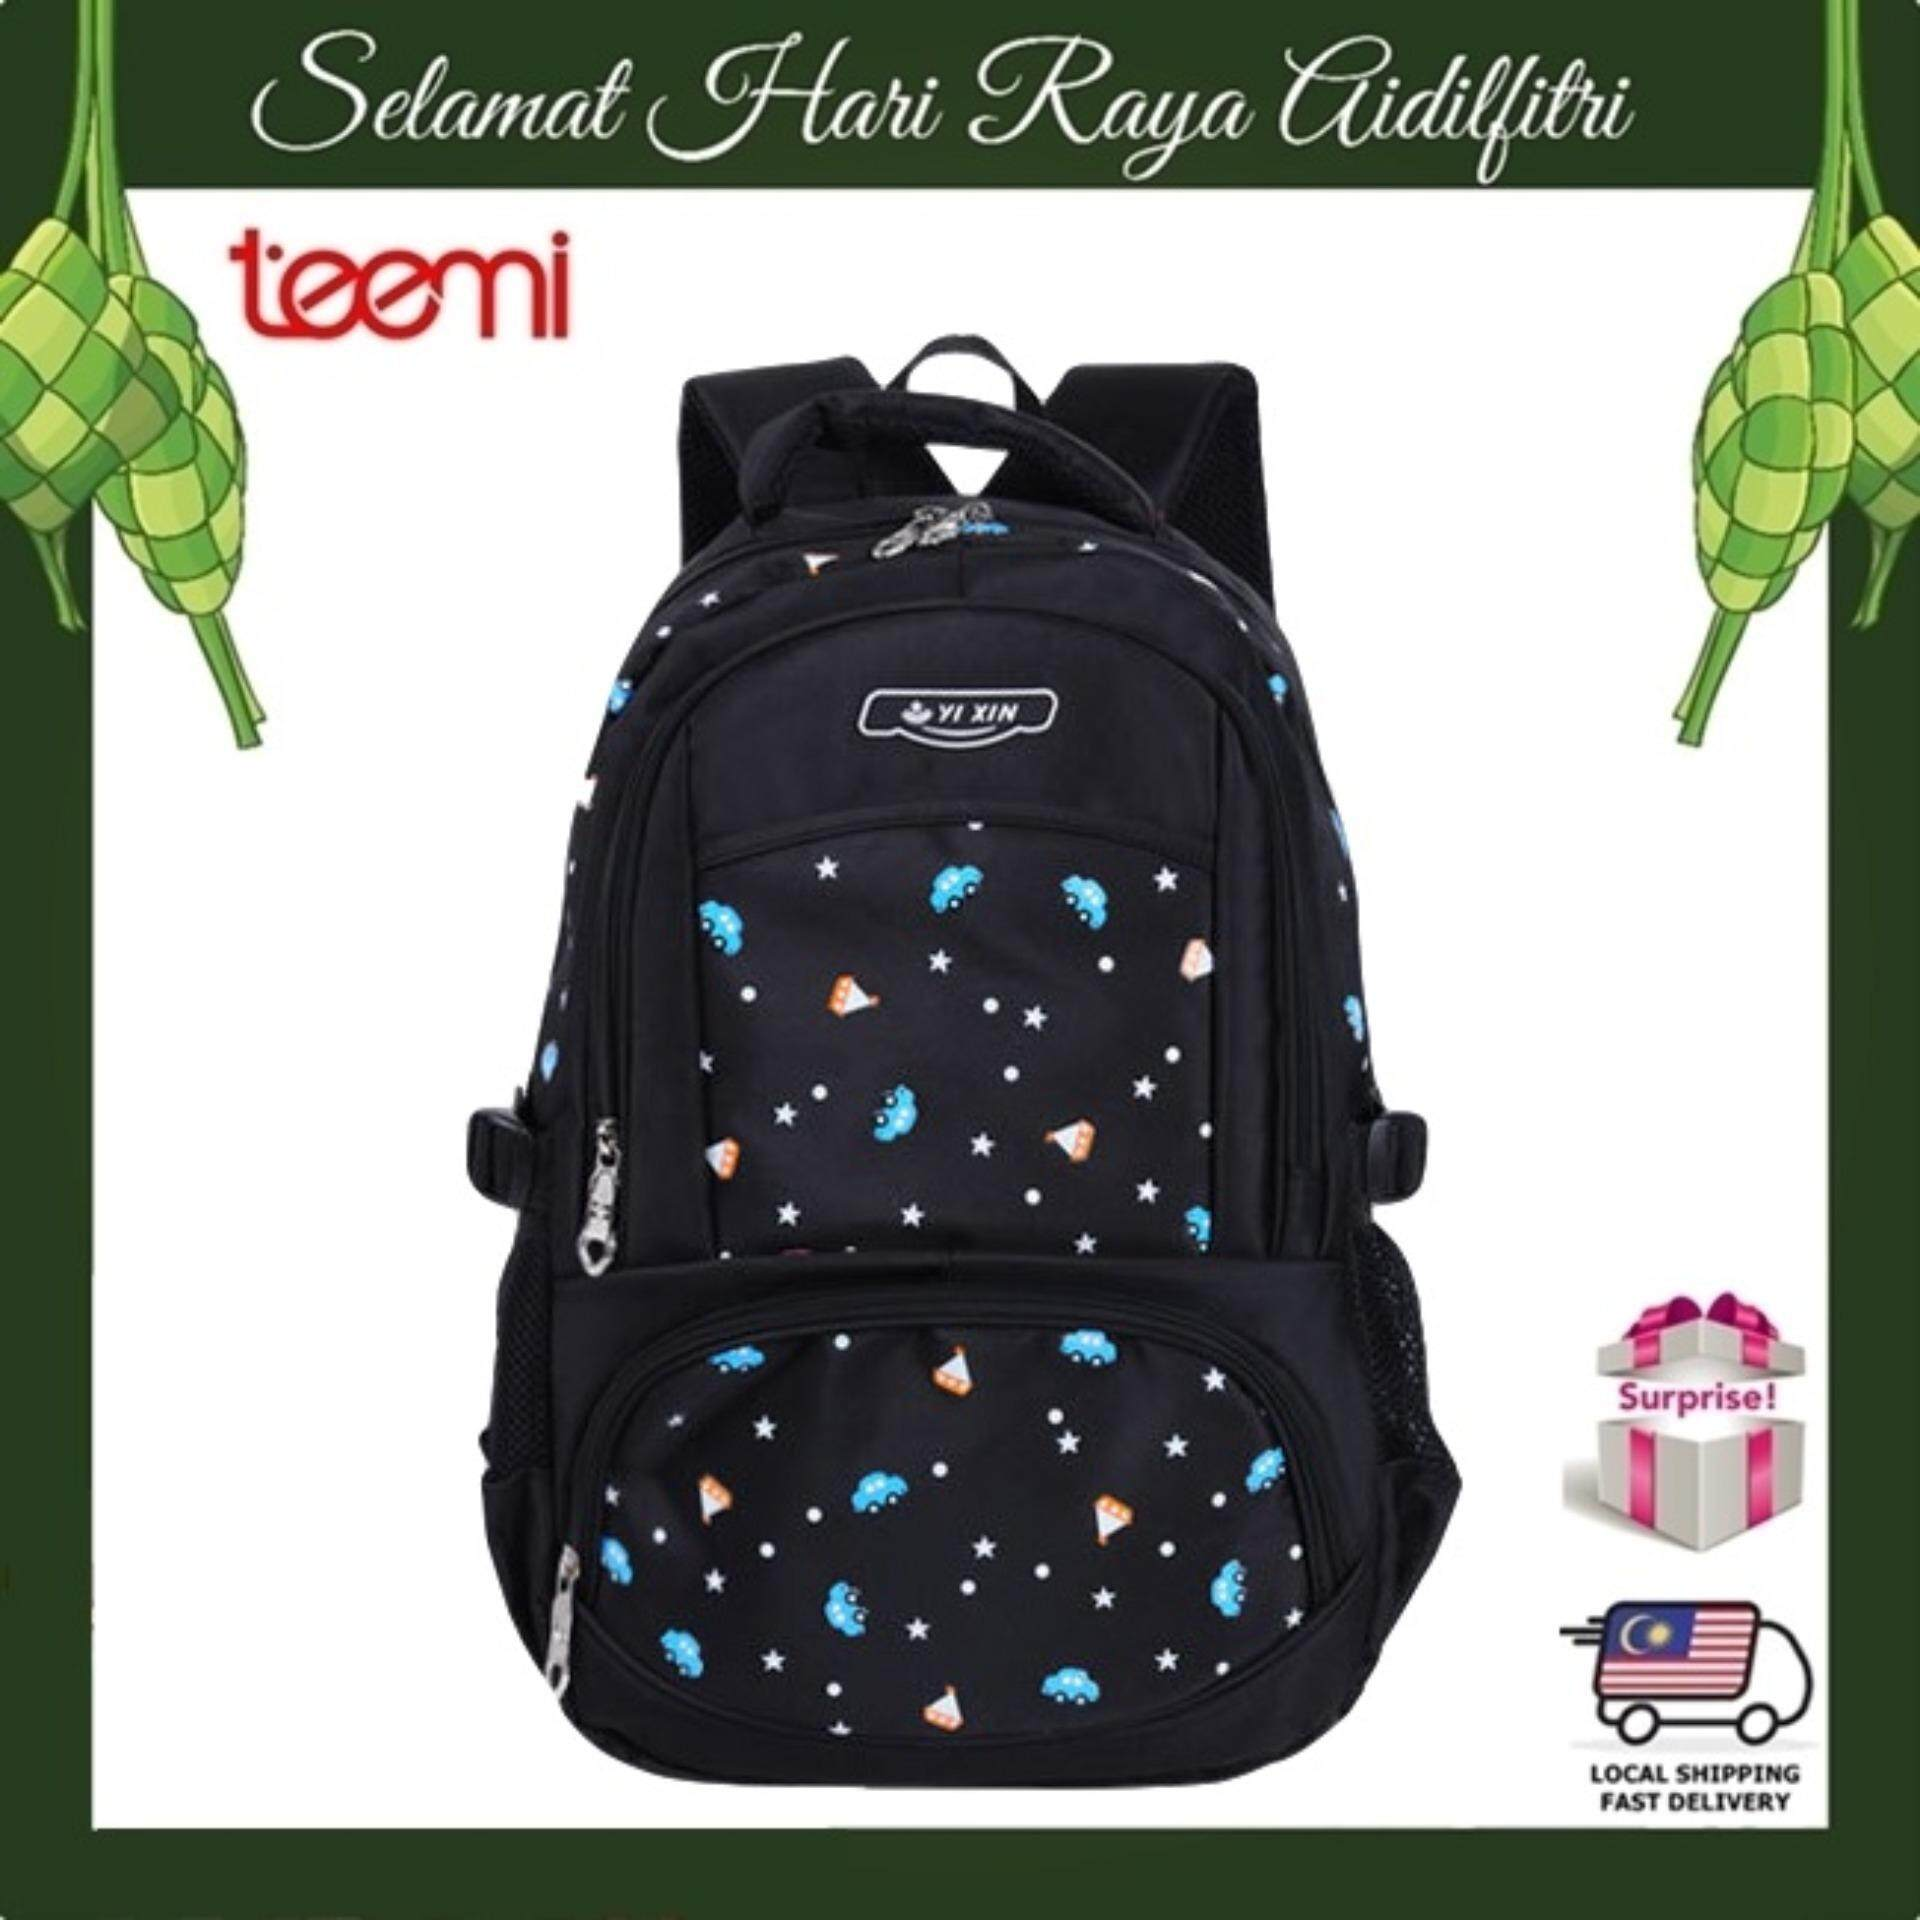 【TEEMI】 Girls Candy Color Primary Secondary Water Resistant Girlish Ergonomic Orthopedic School Bag Kids Children Laptop Backpack - Black